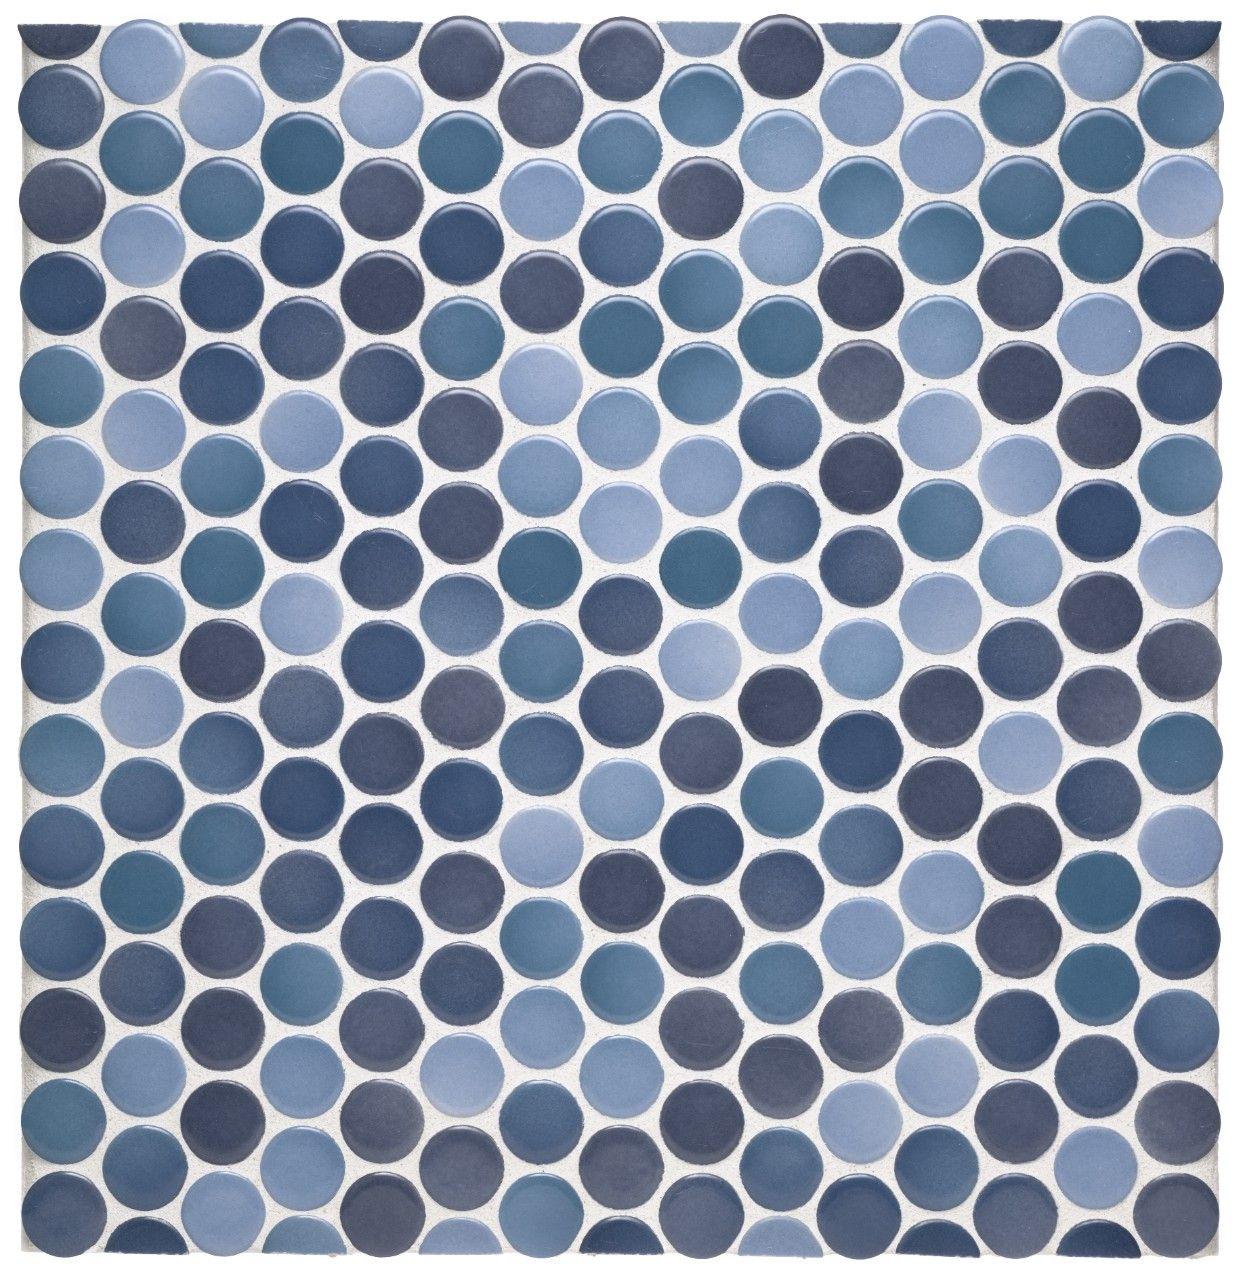 Penny Tile — Kitchen Collections | Waterworks backsplash | Tile and ...